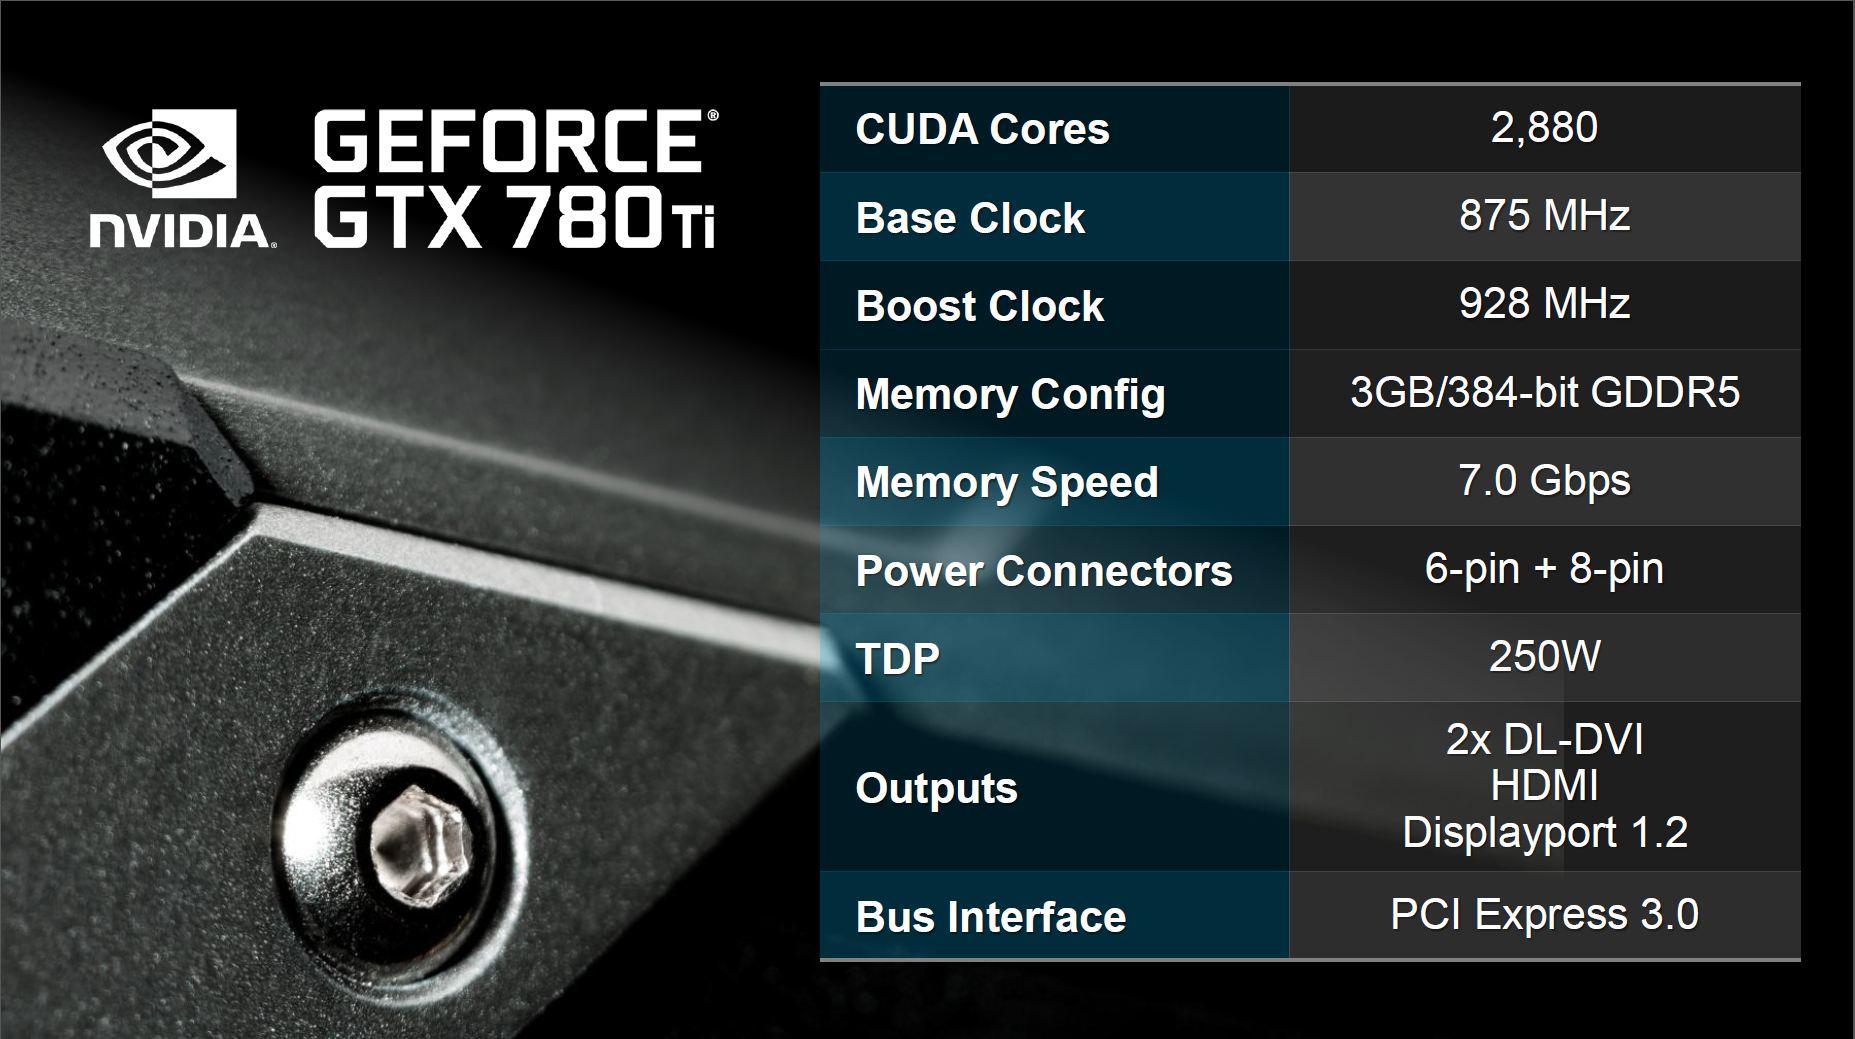 [XF] 霸者風采 效能驚嘆ASUS ROG Matrix GTX 780 Ti 3G 評測